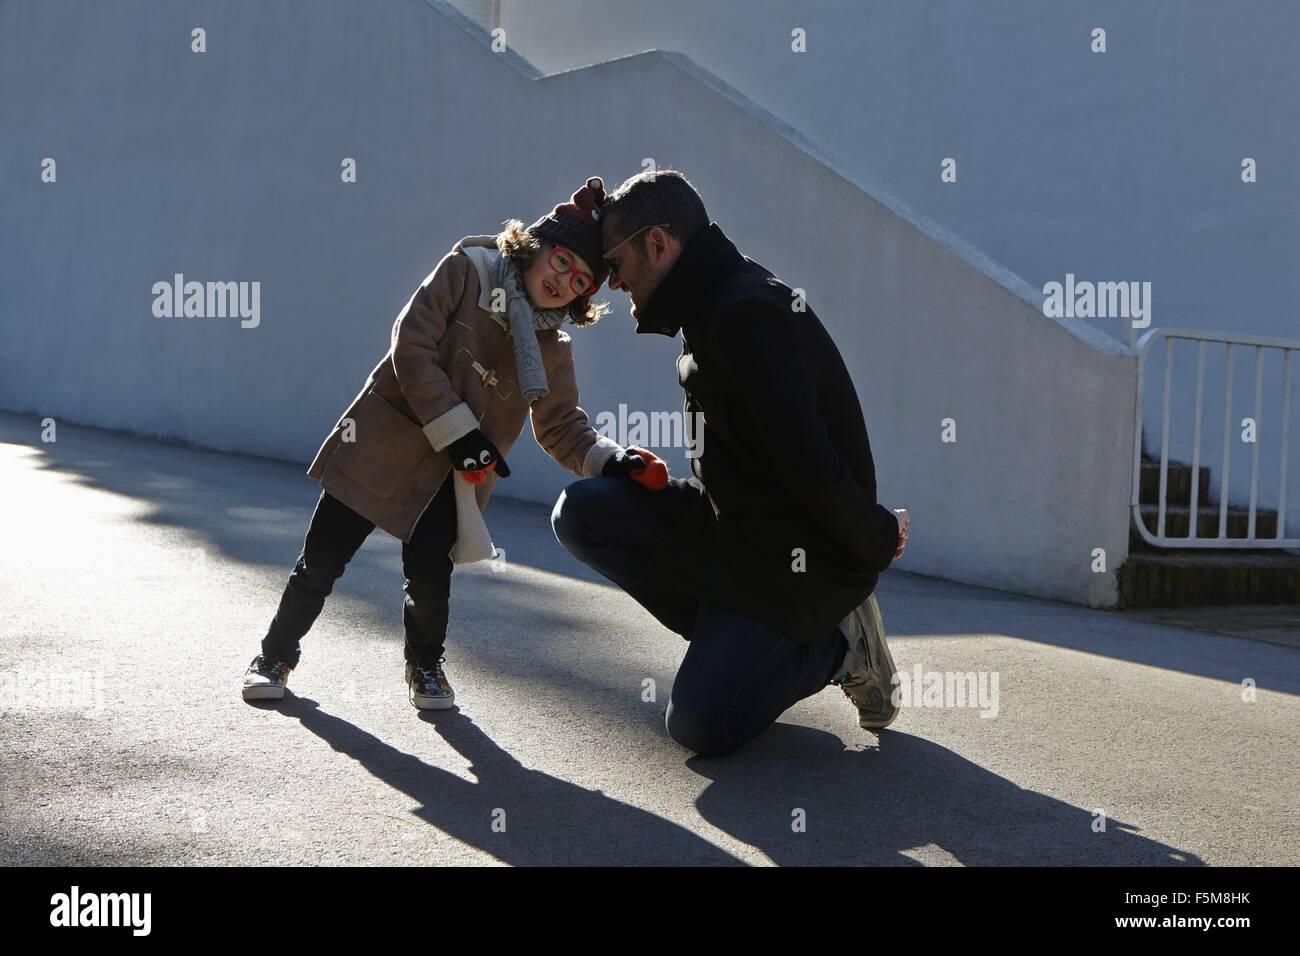 Padre e hija vistiendo duffle coat cabeza a cabeza en calle Imagen De Stock